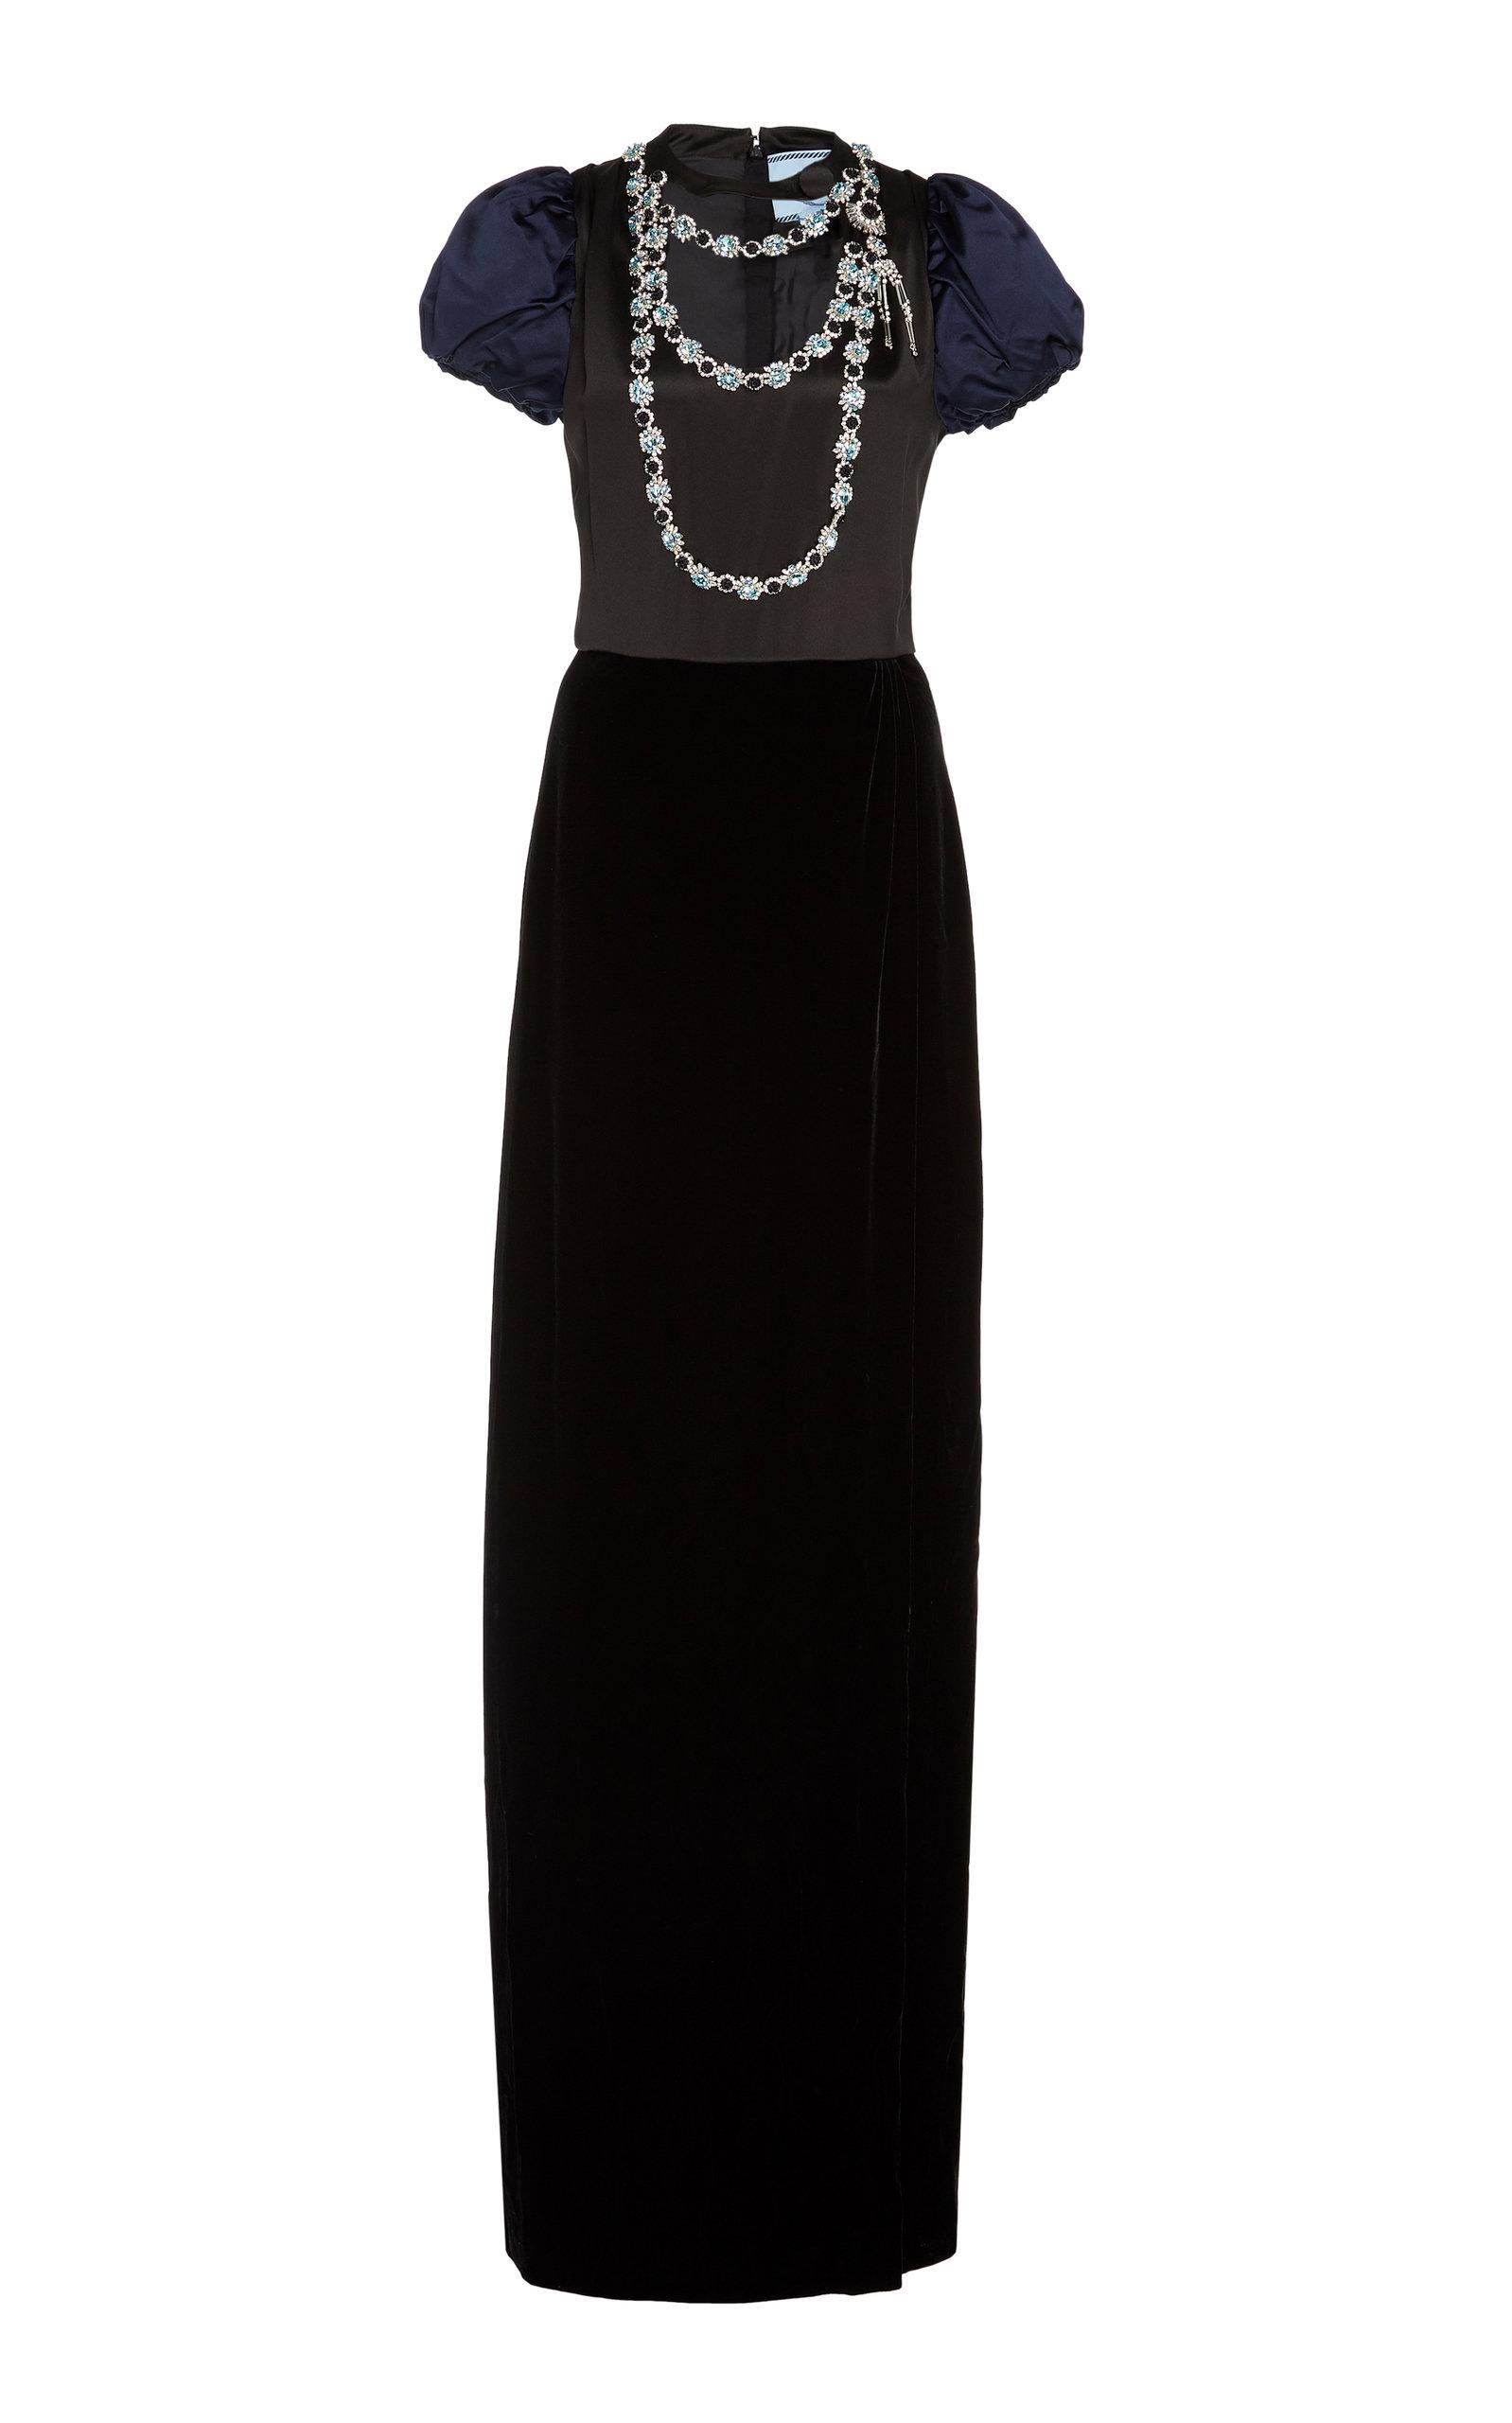 Buy Prada Embellished Satin-Paneled Velvet Gown online, shop Prada at the best price